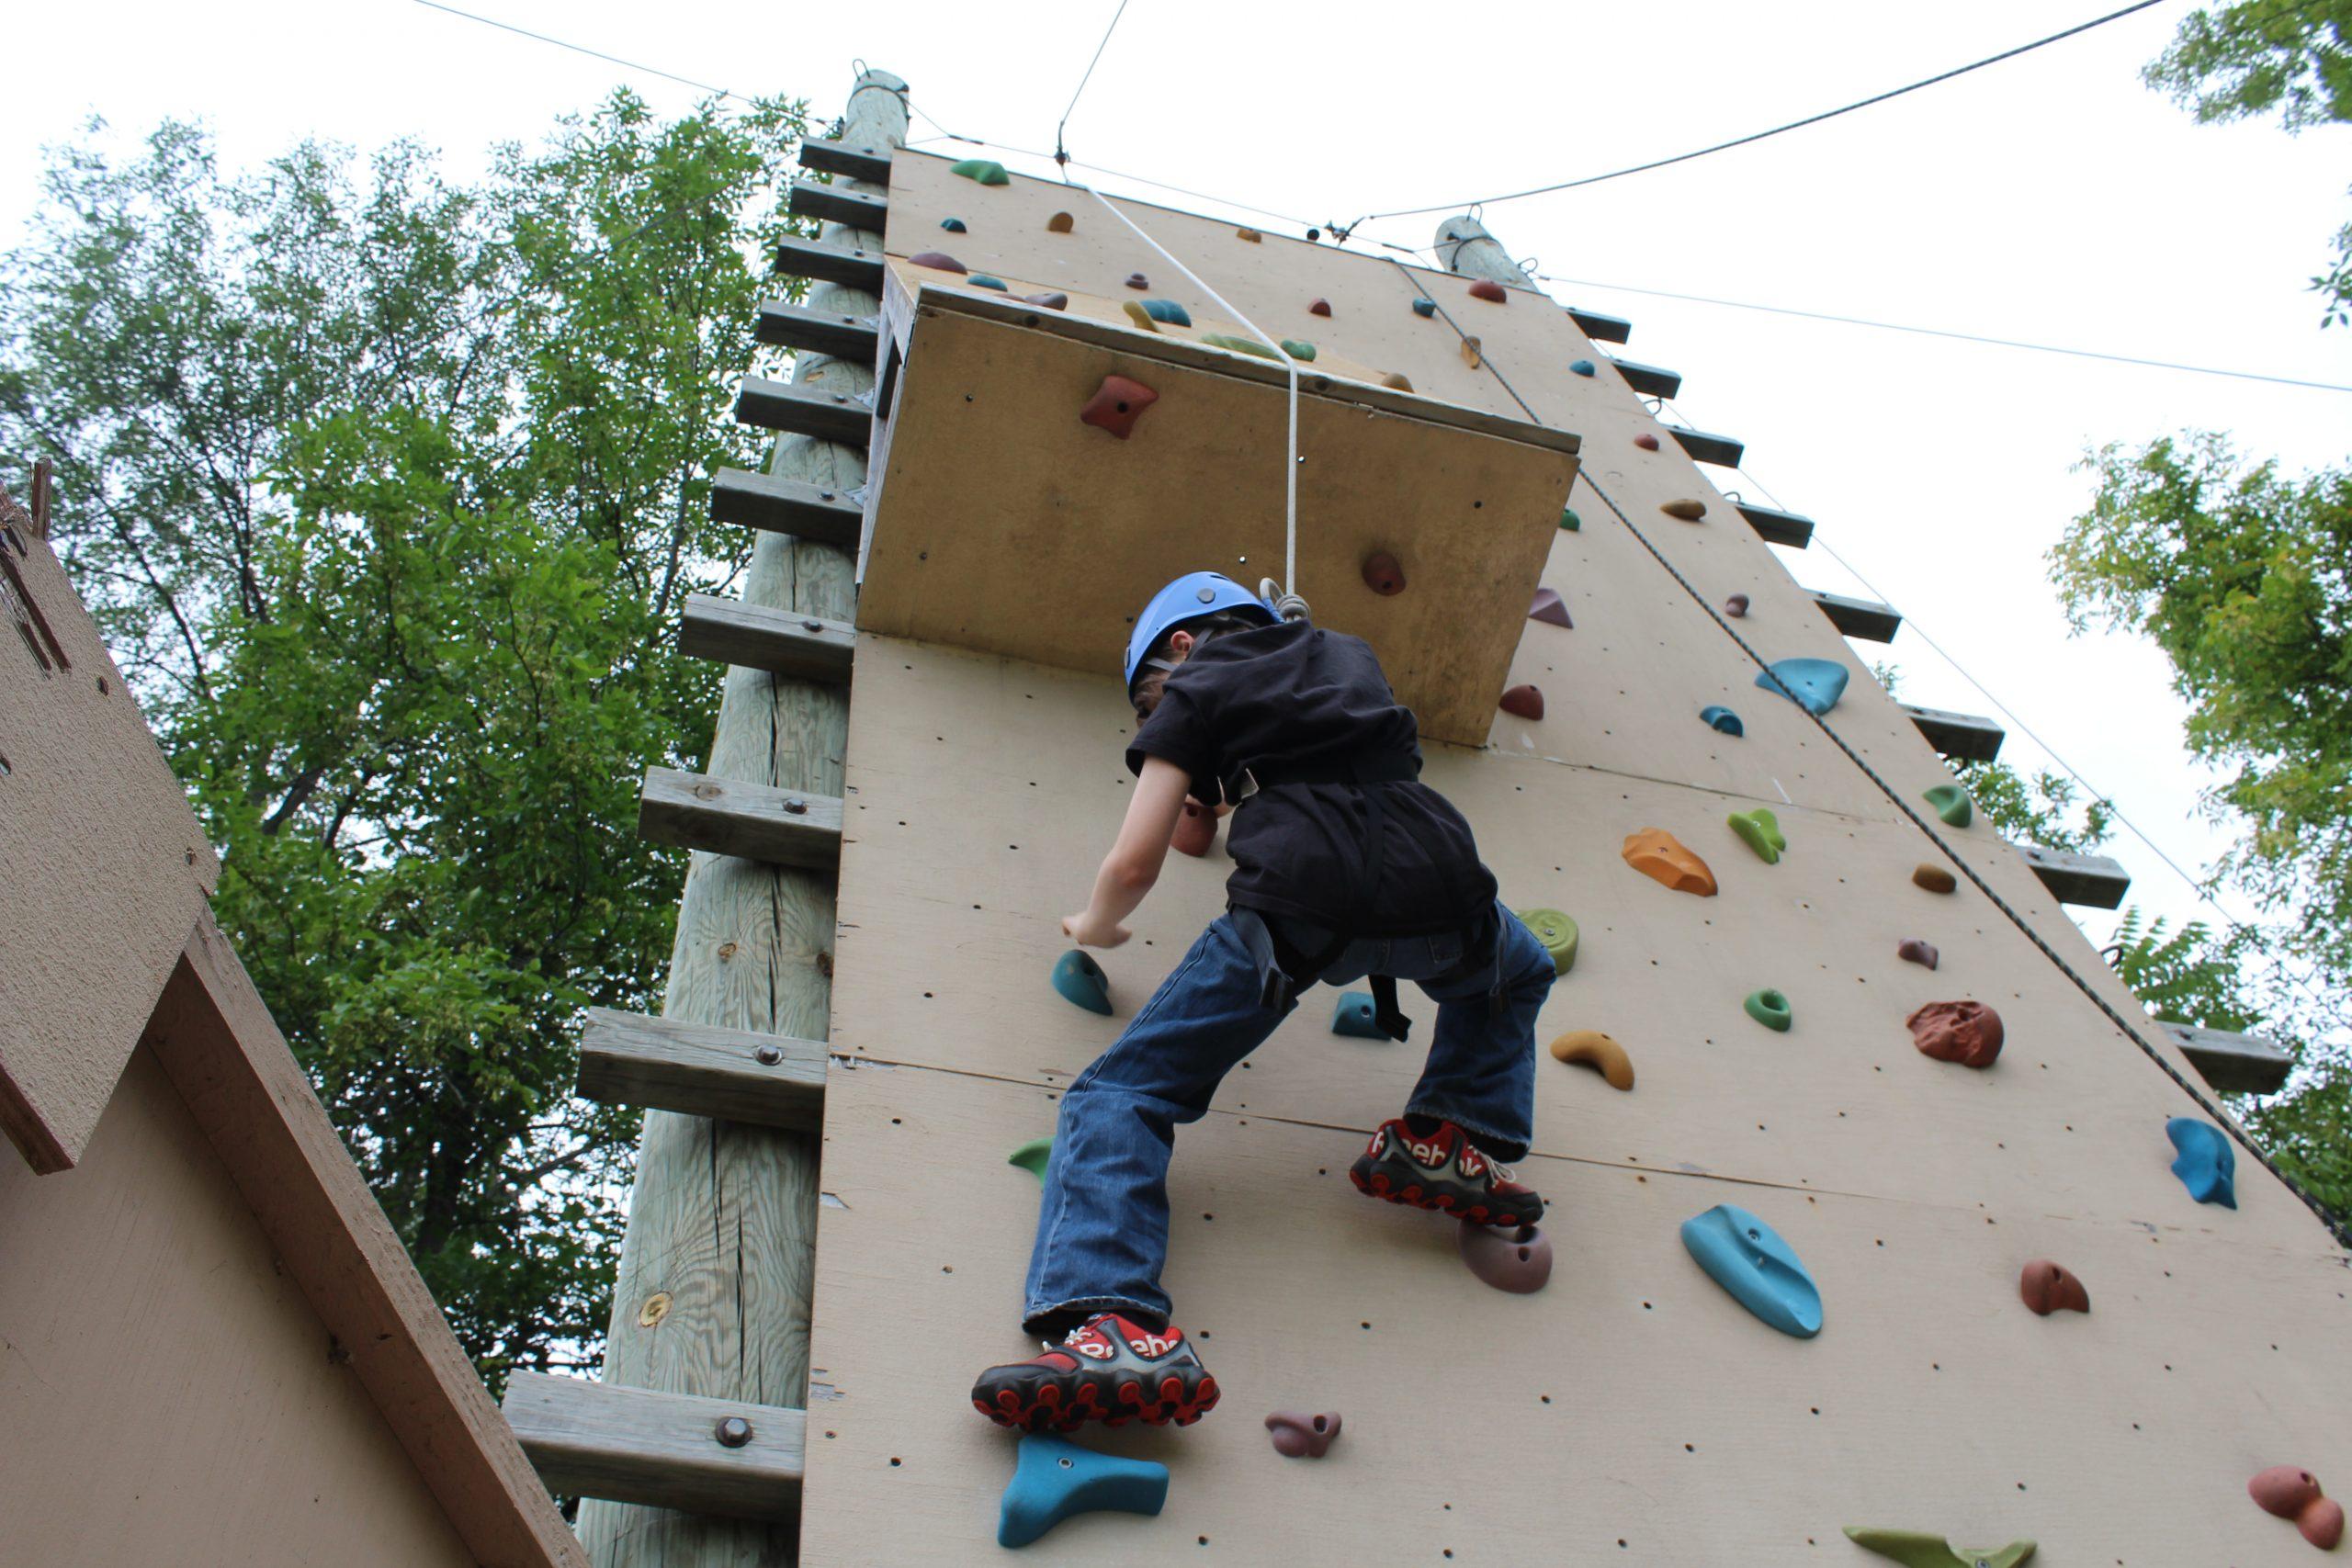 camper rock climbing